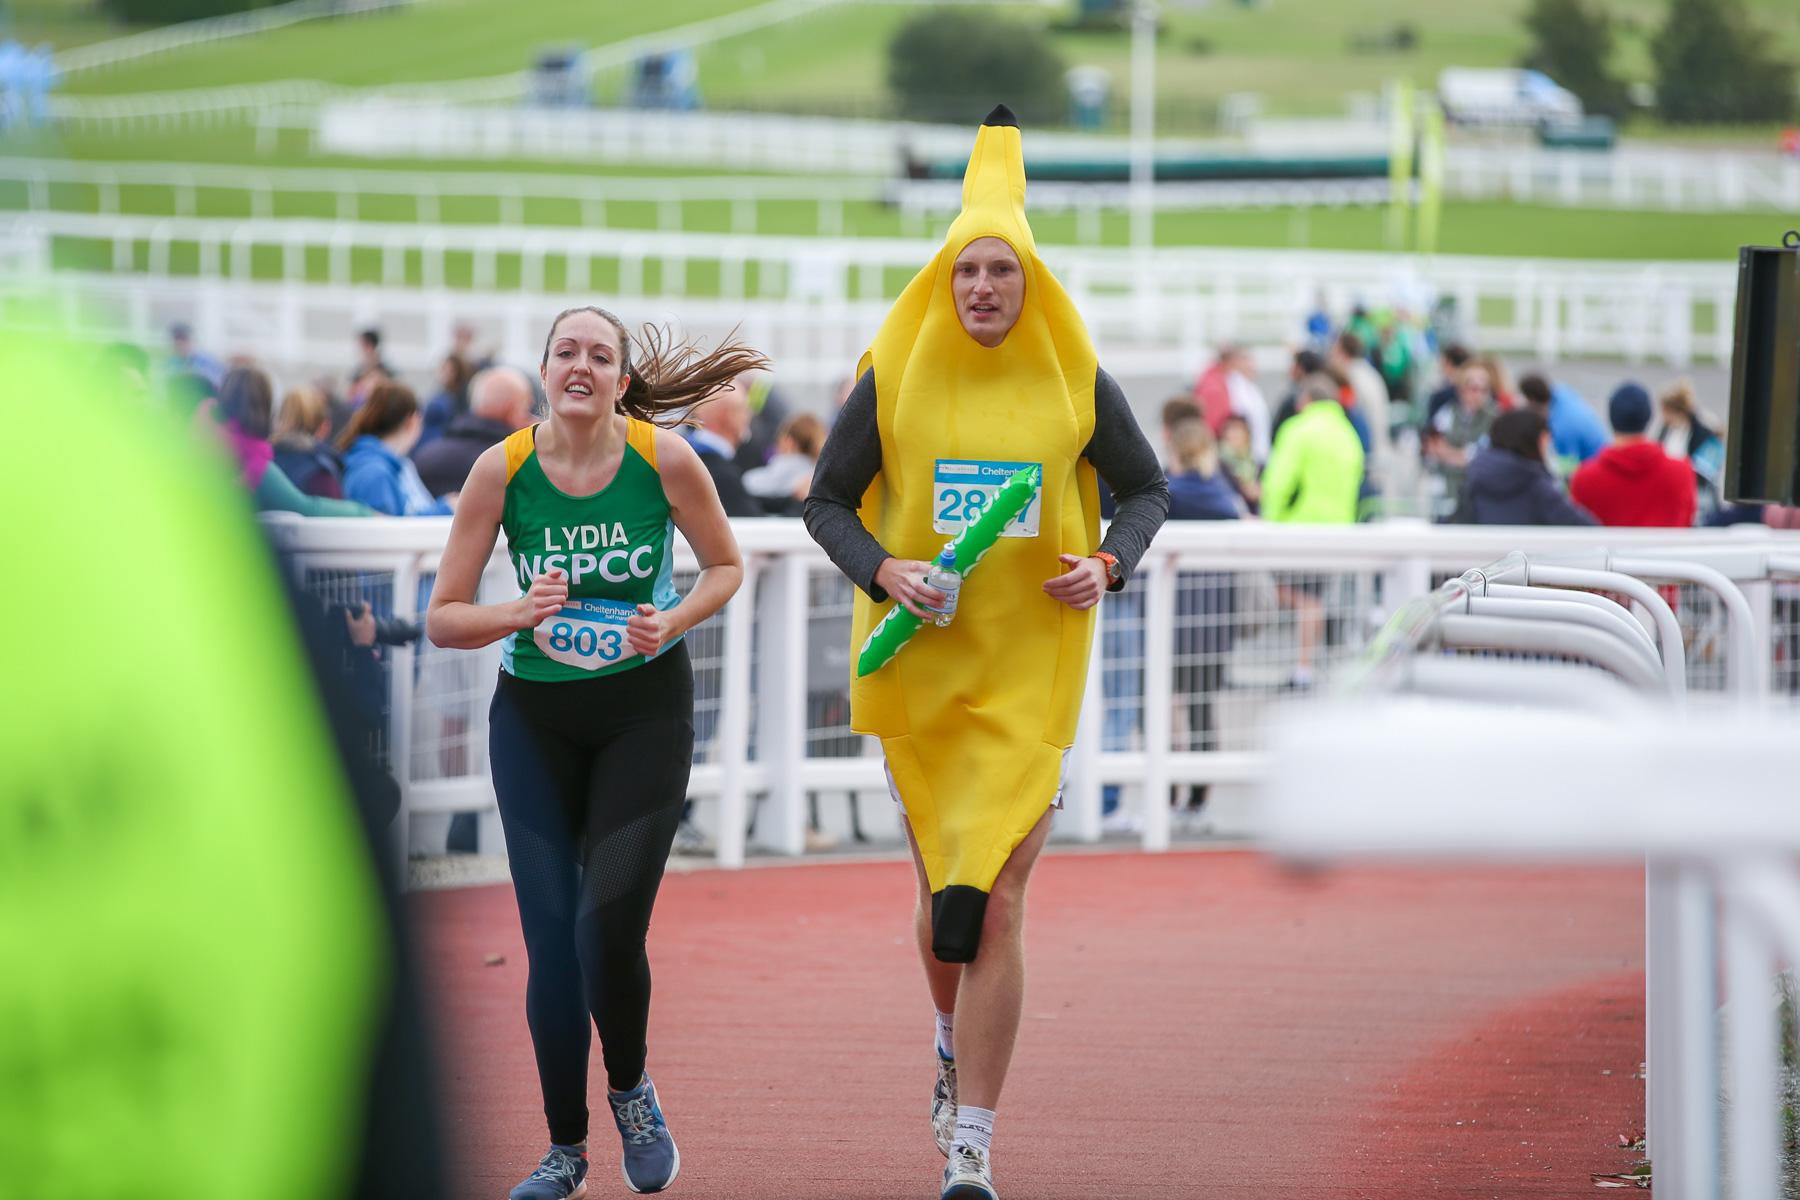 Macmillan-charity-marathon-run-cheltenham-racecourse-september-2018-natalia-smith-photography0329.jpg